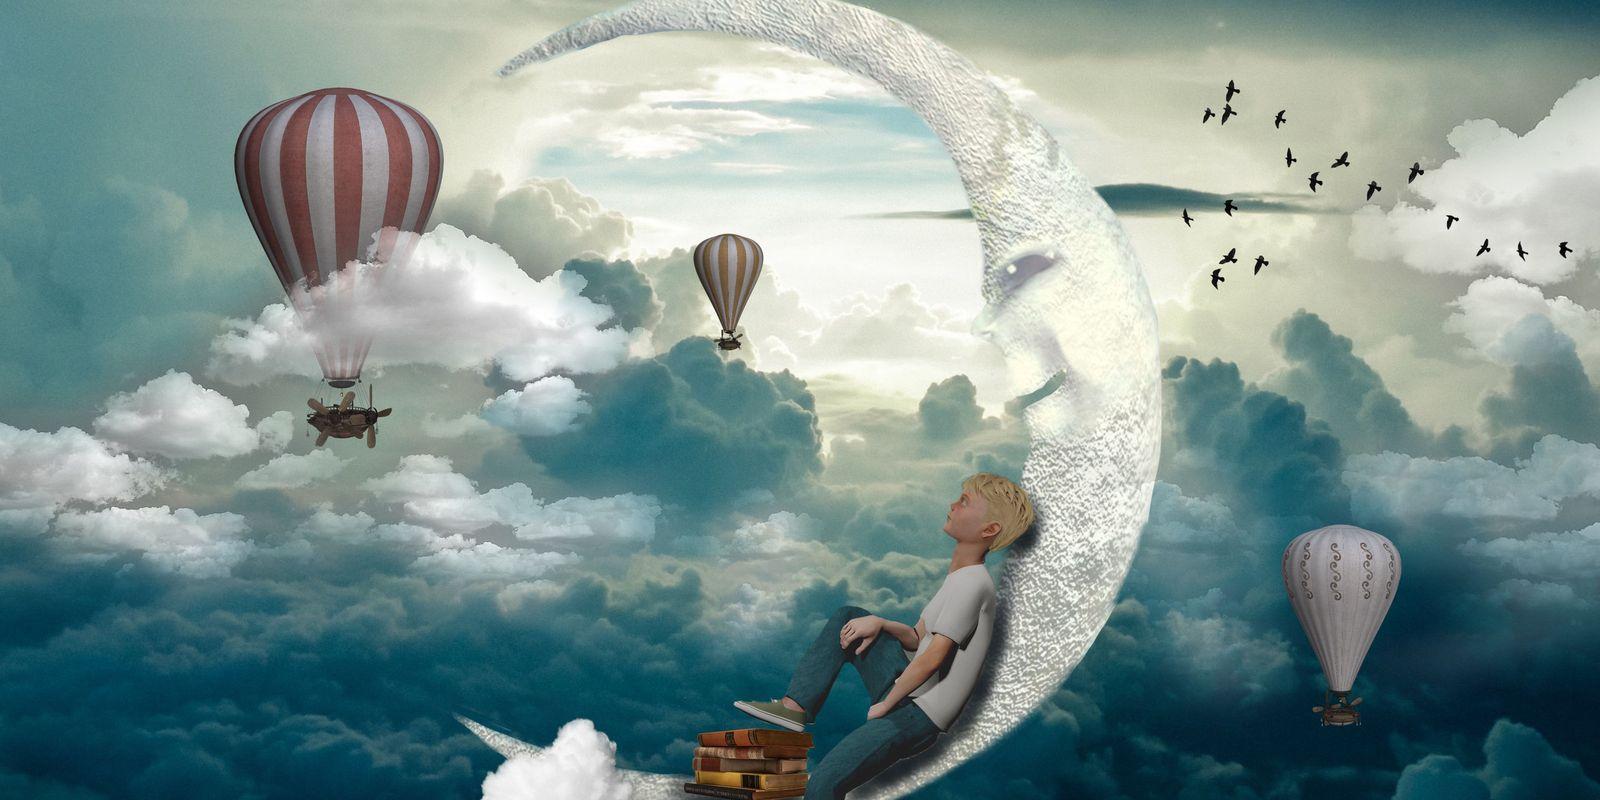 Mysticsartdesign / pixabay.com